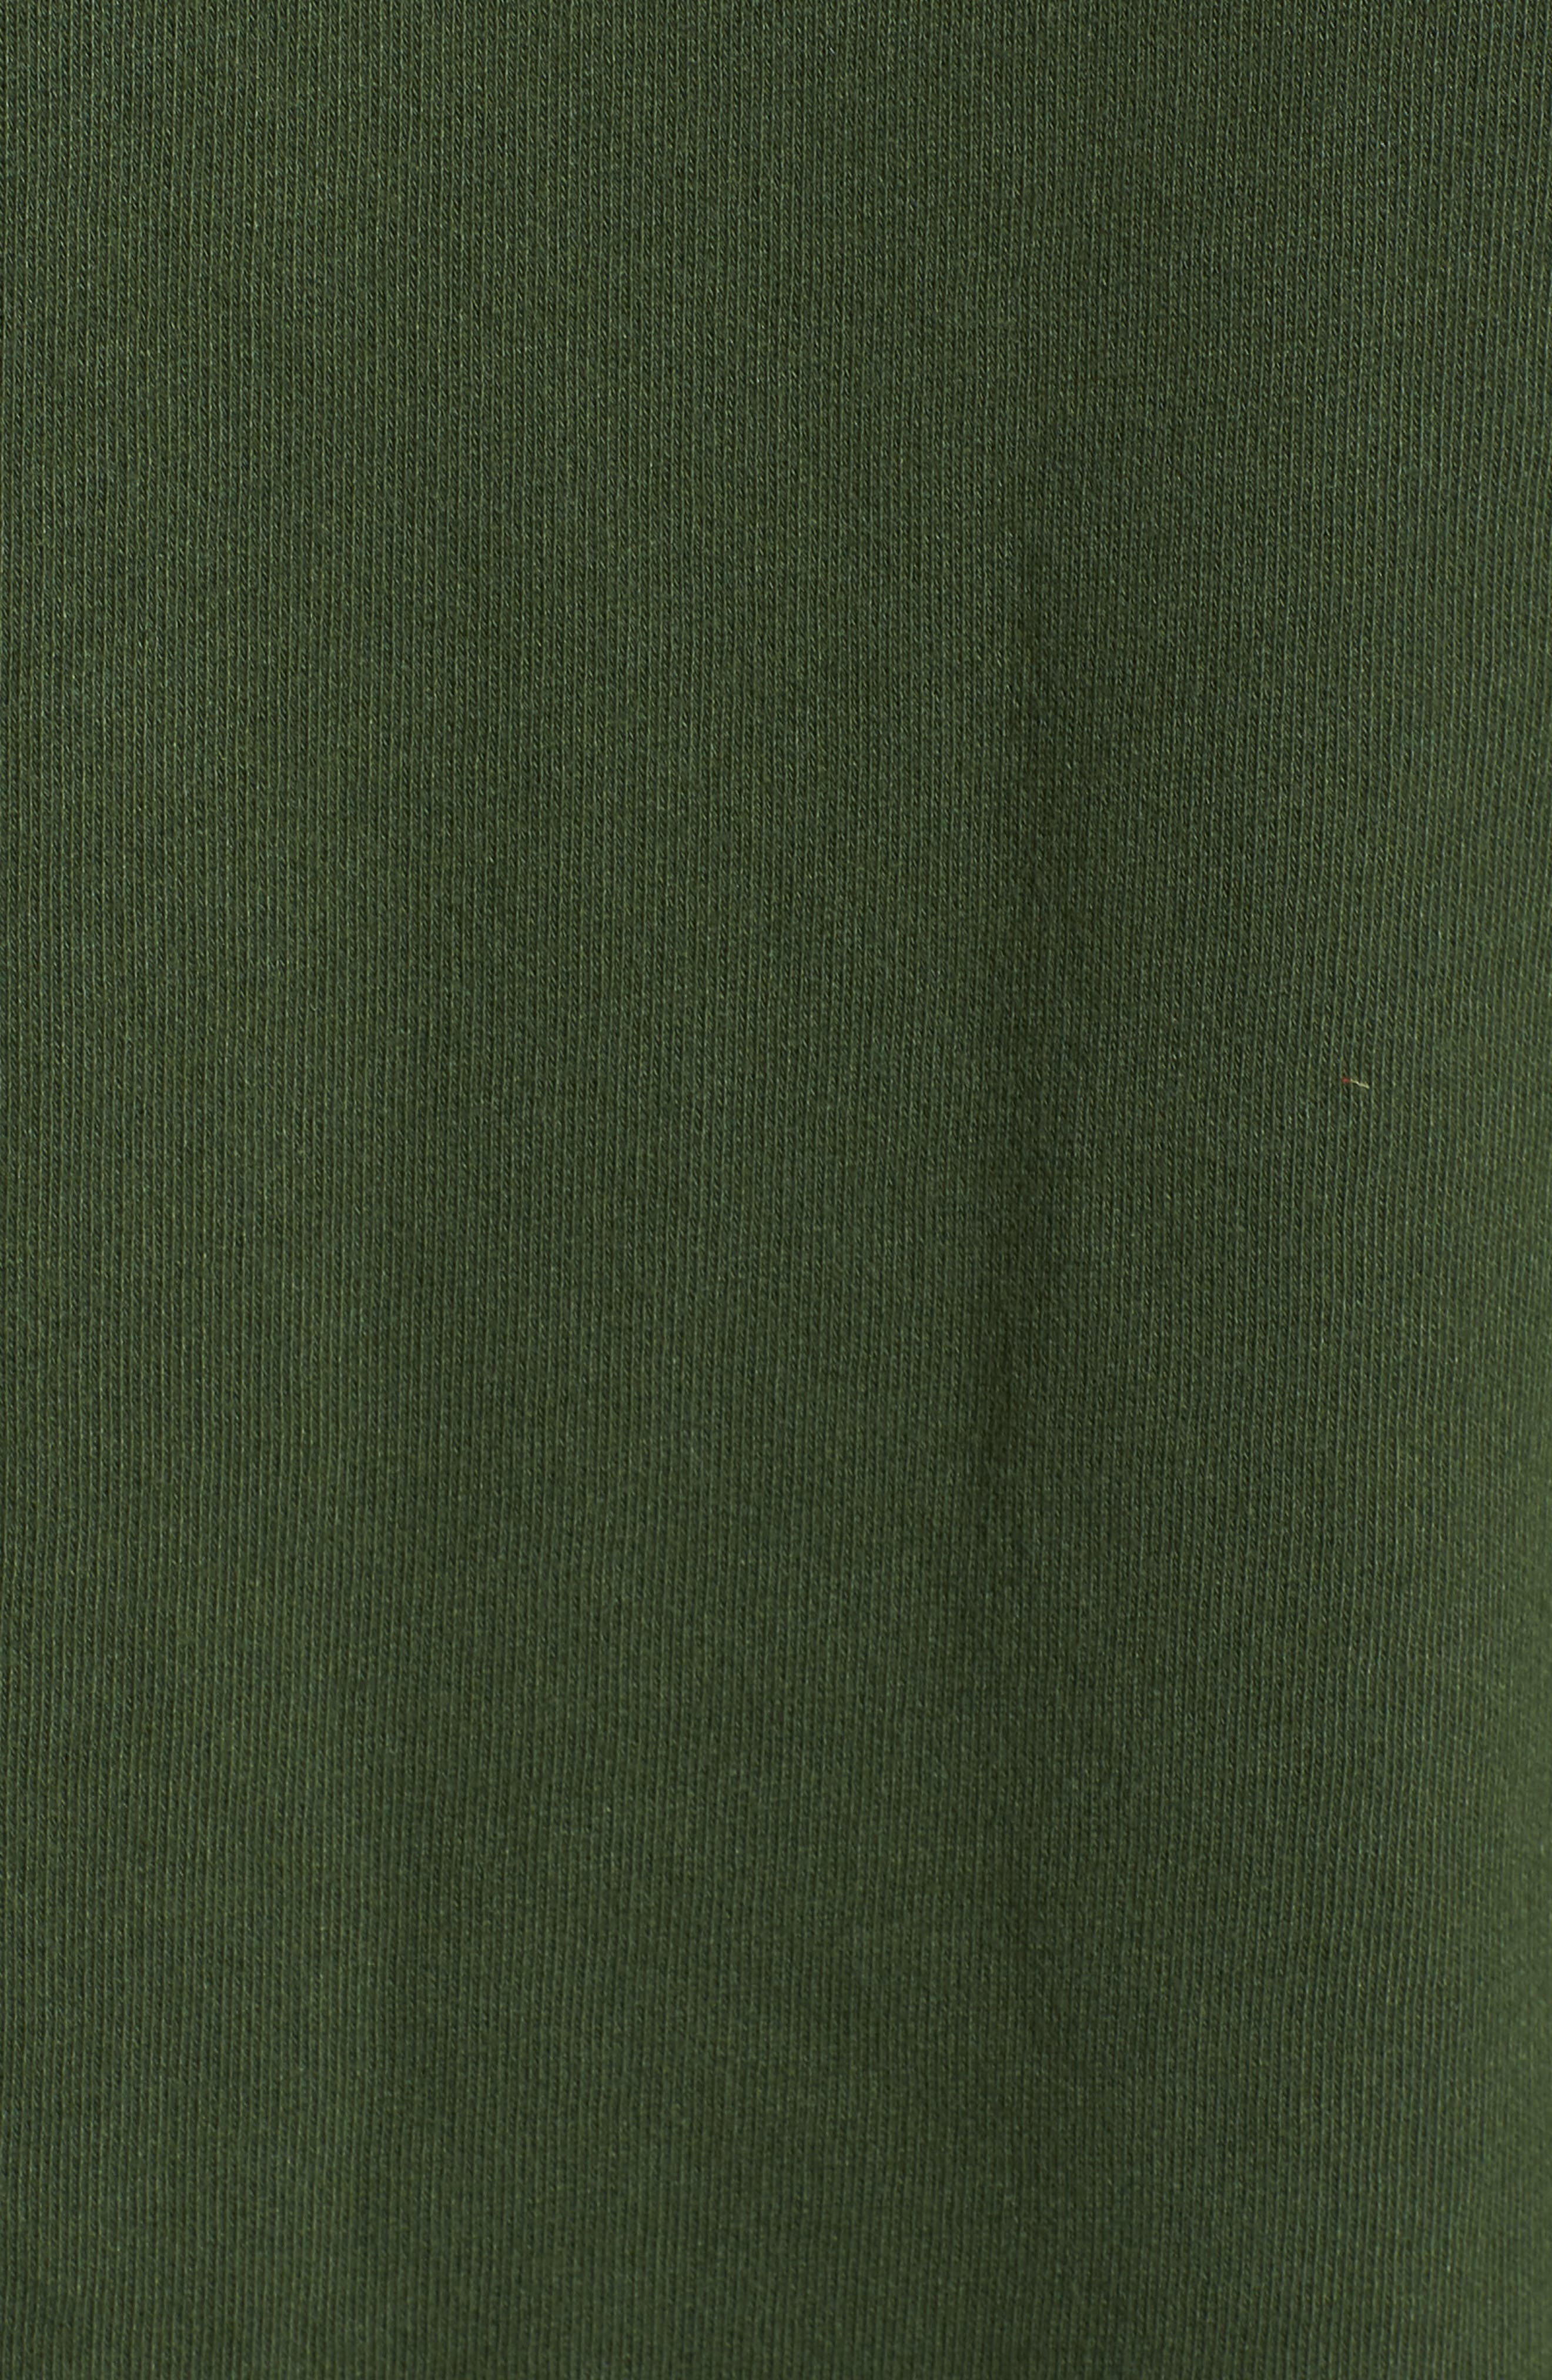 Upper Bis Brode Sweatshirt,                             Alternate thumbnail 6, color,                             340